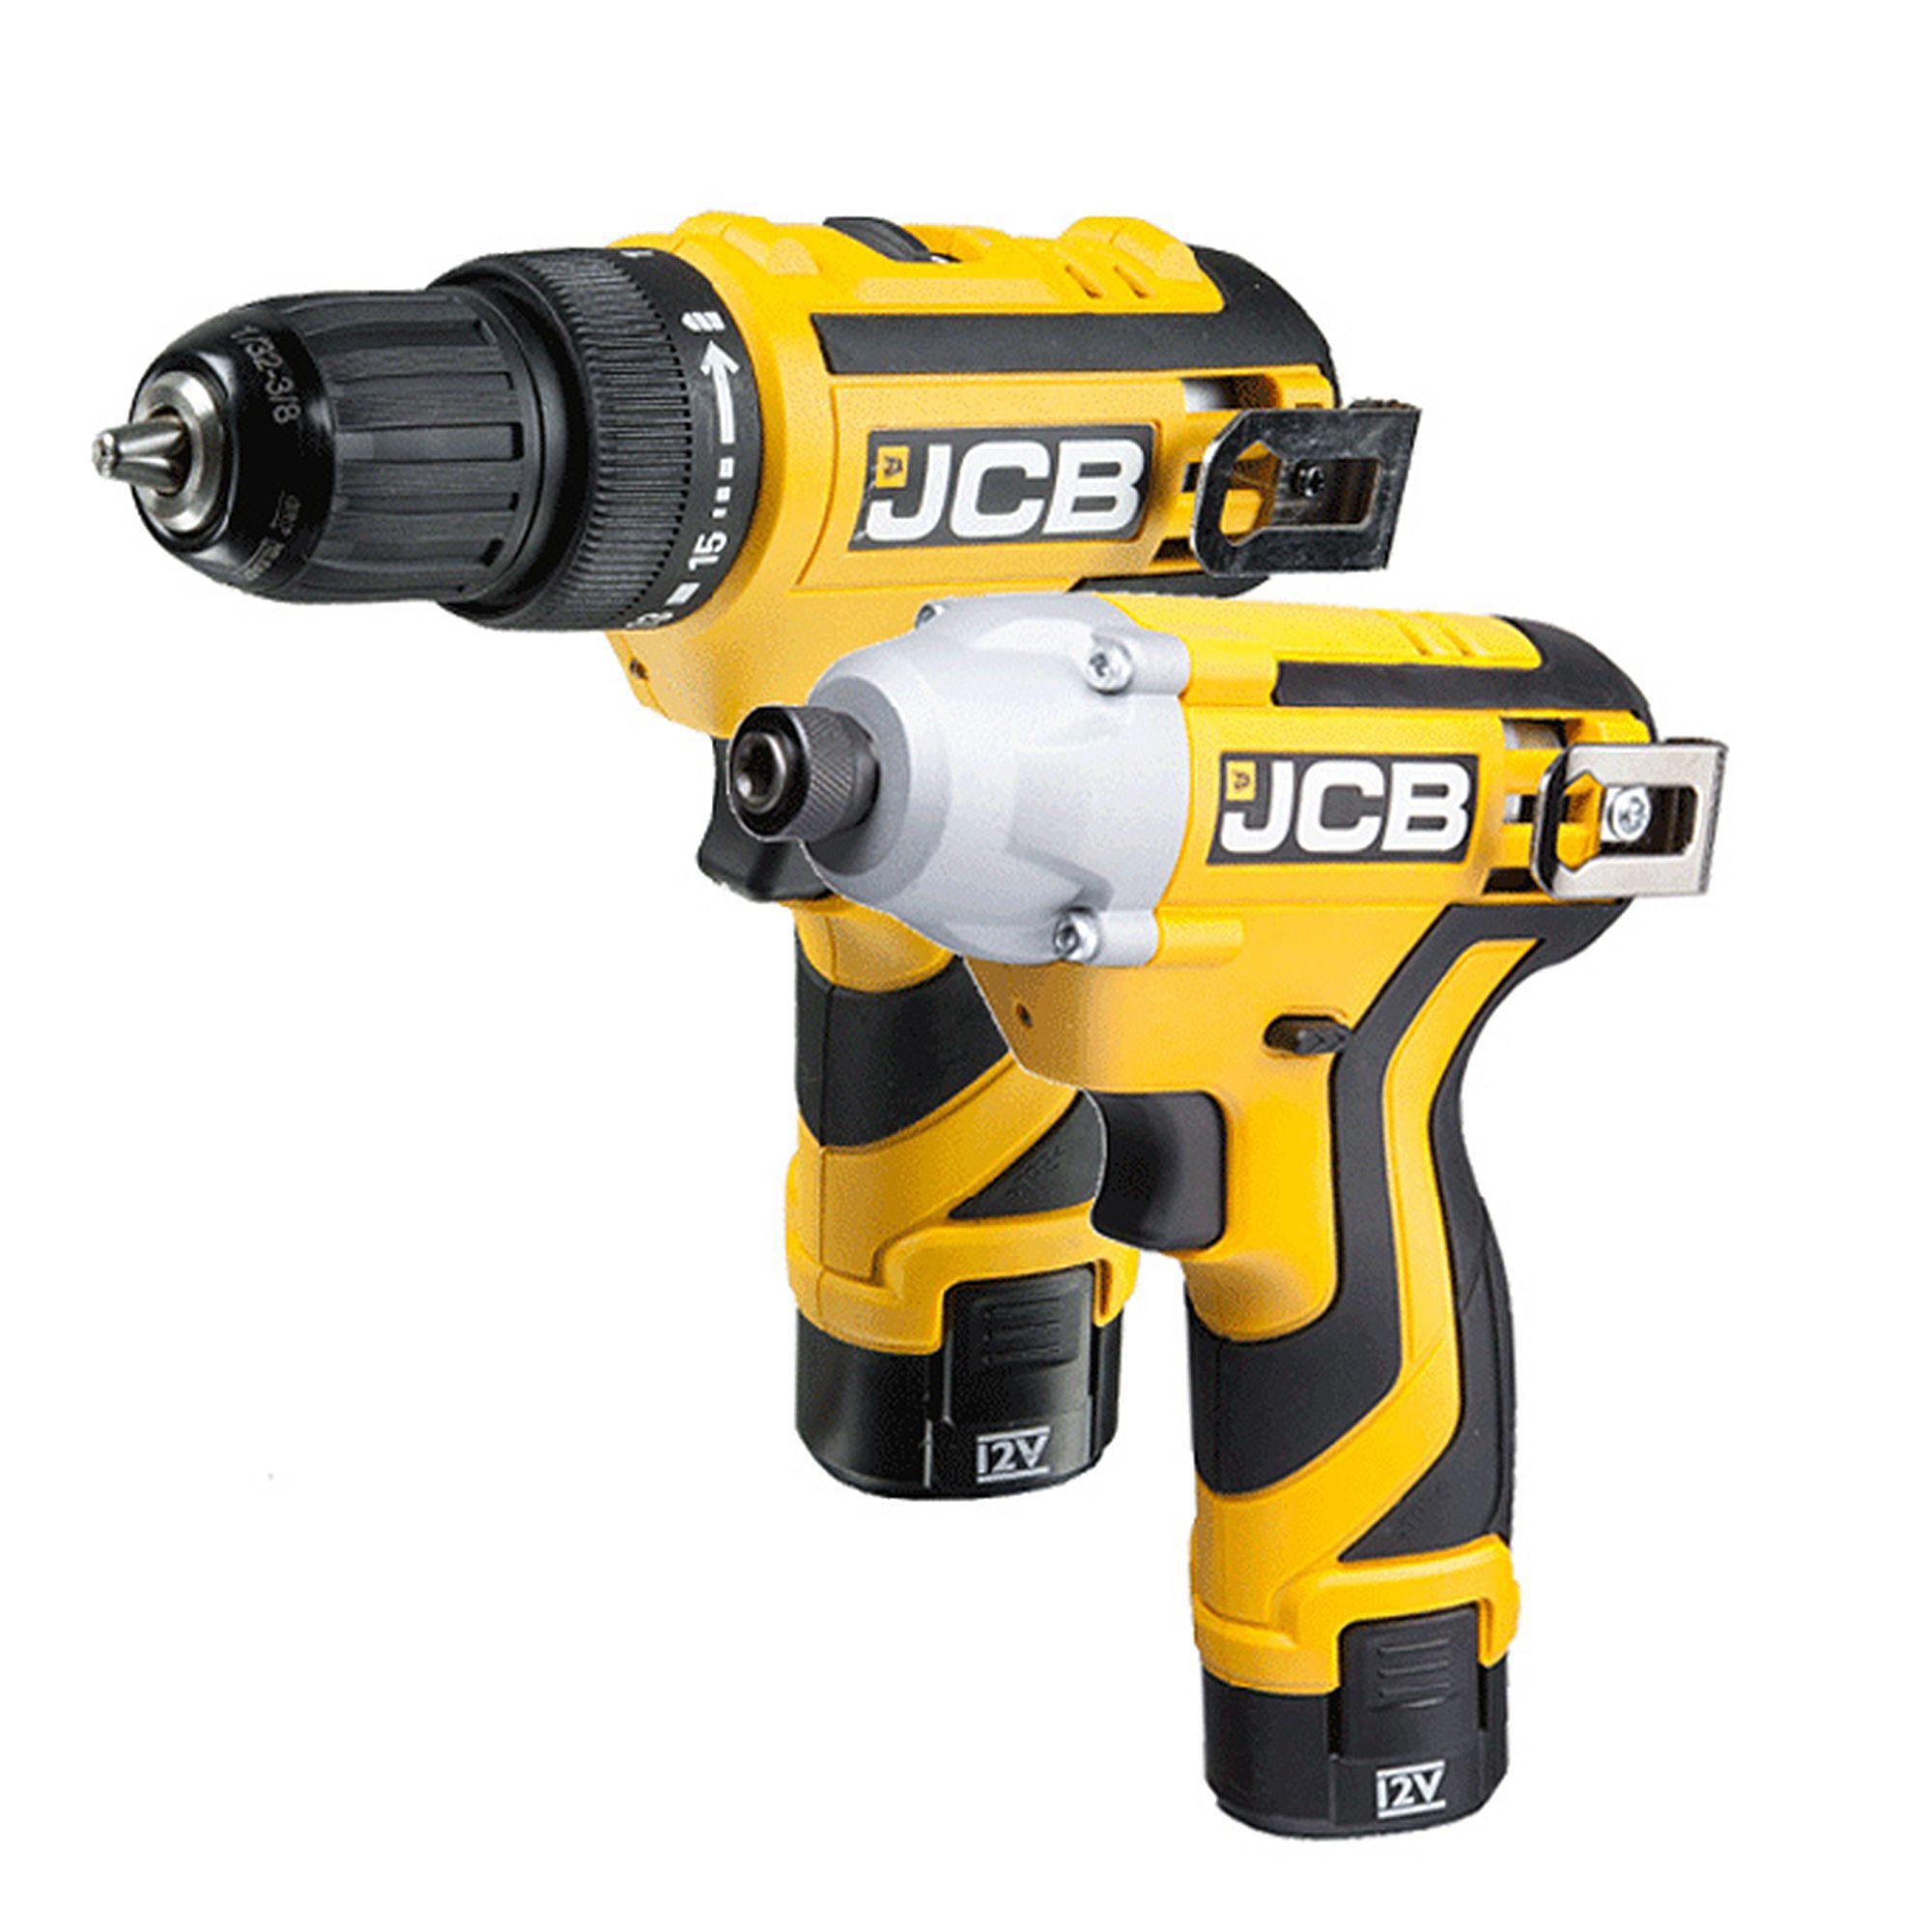 Jcb 1 3ah Li Ion Combi Drill Amp Impact Driver Twin Pack 2